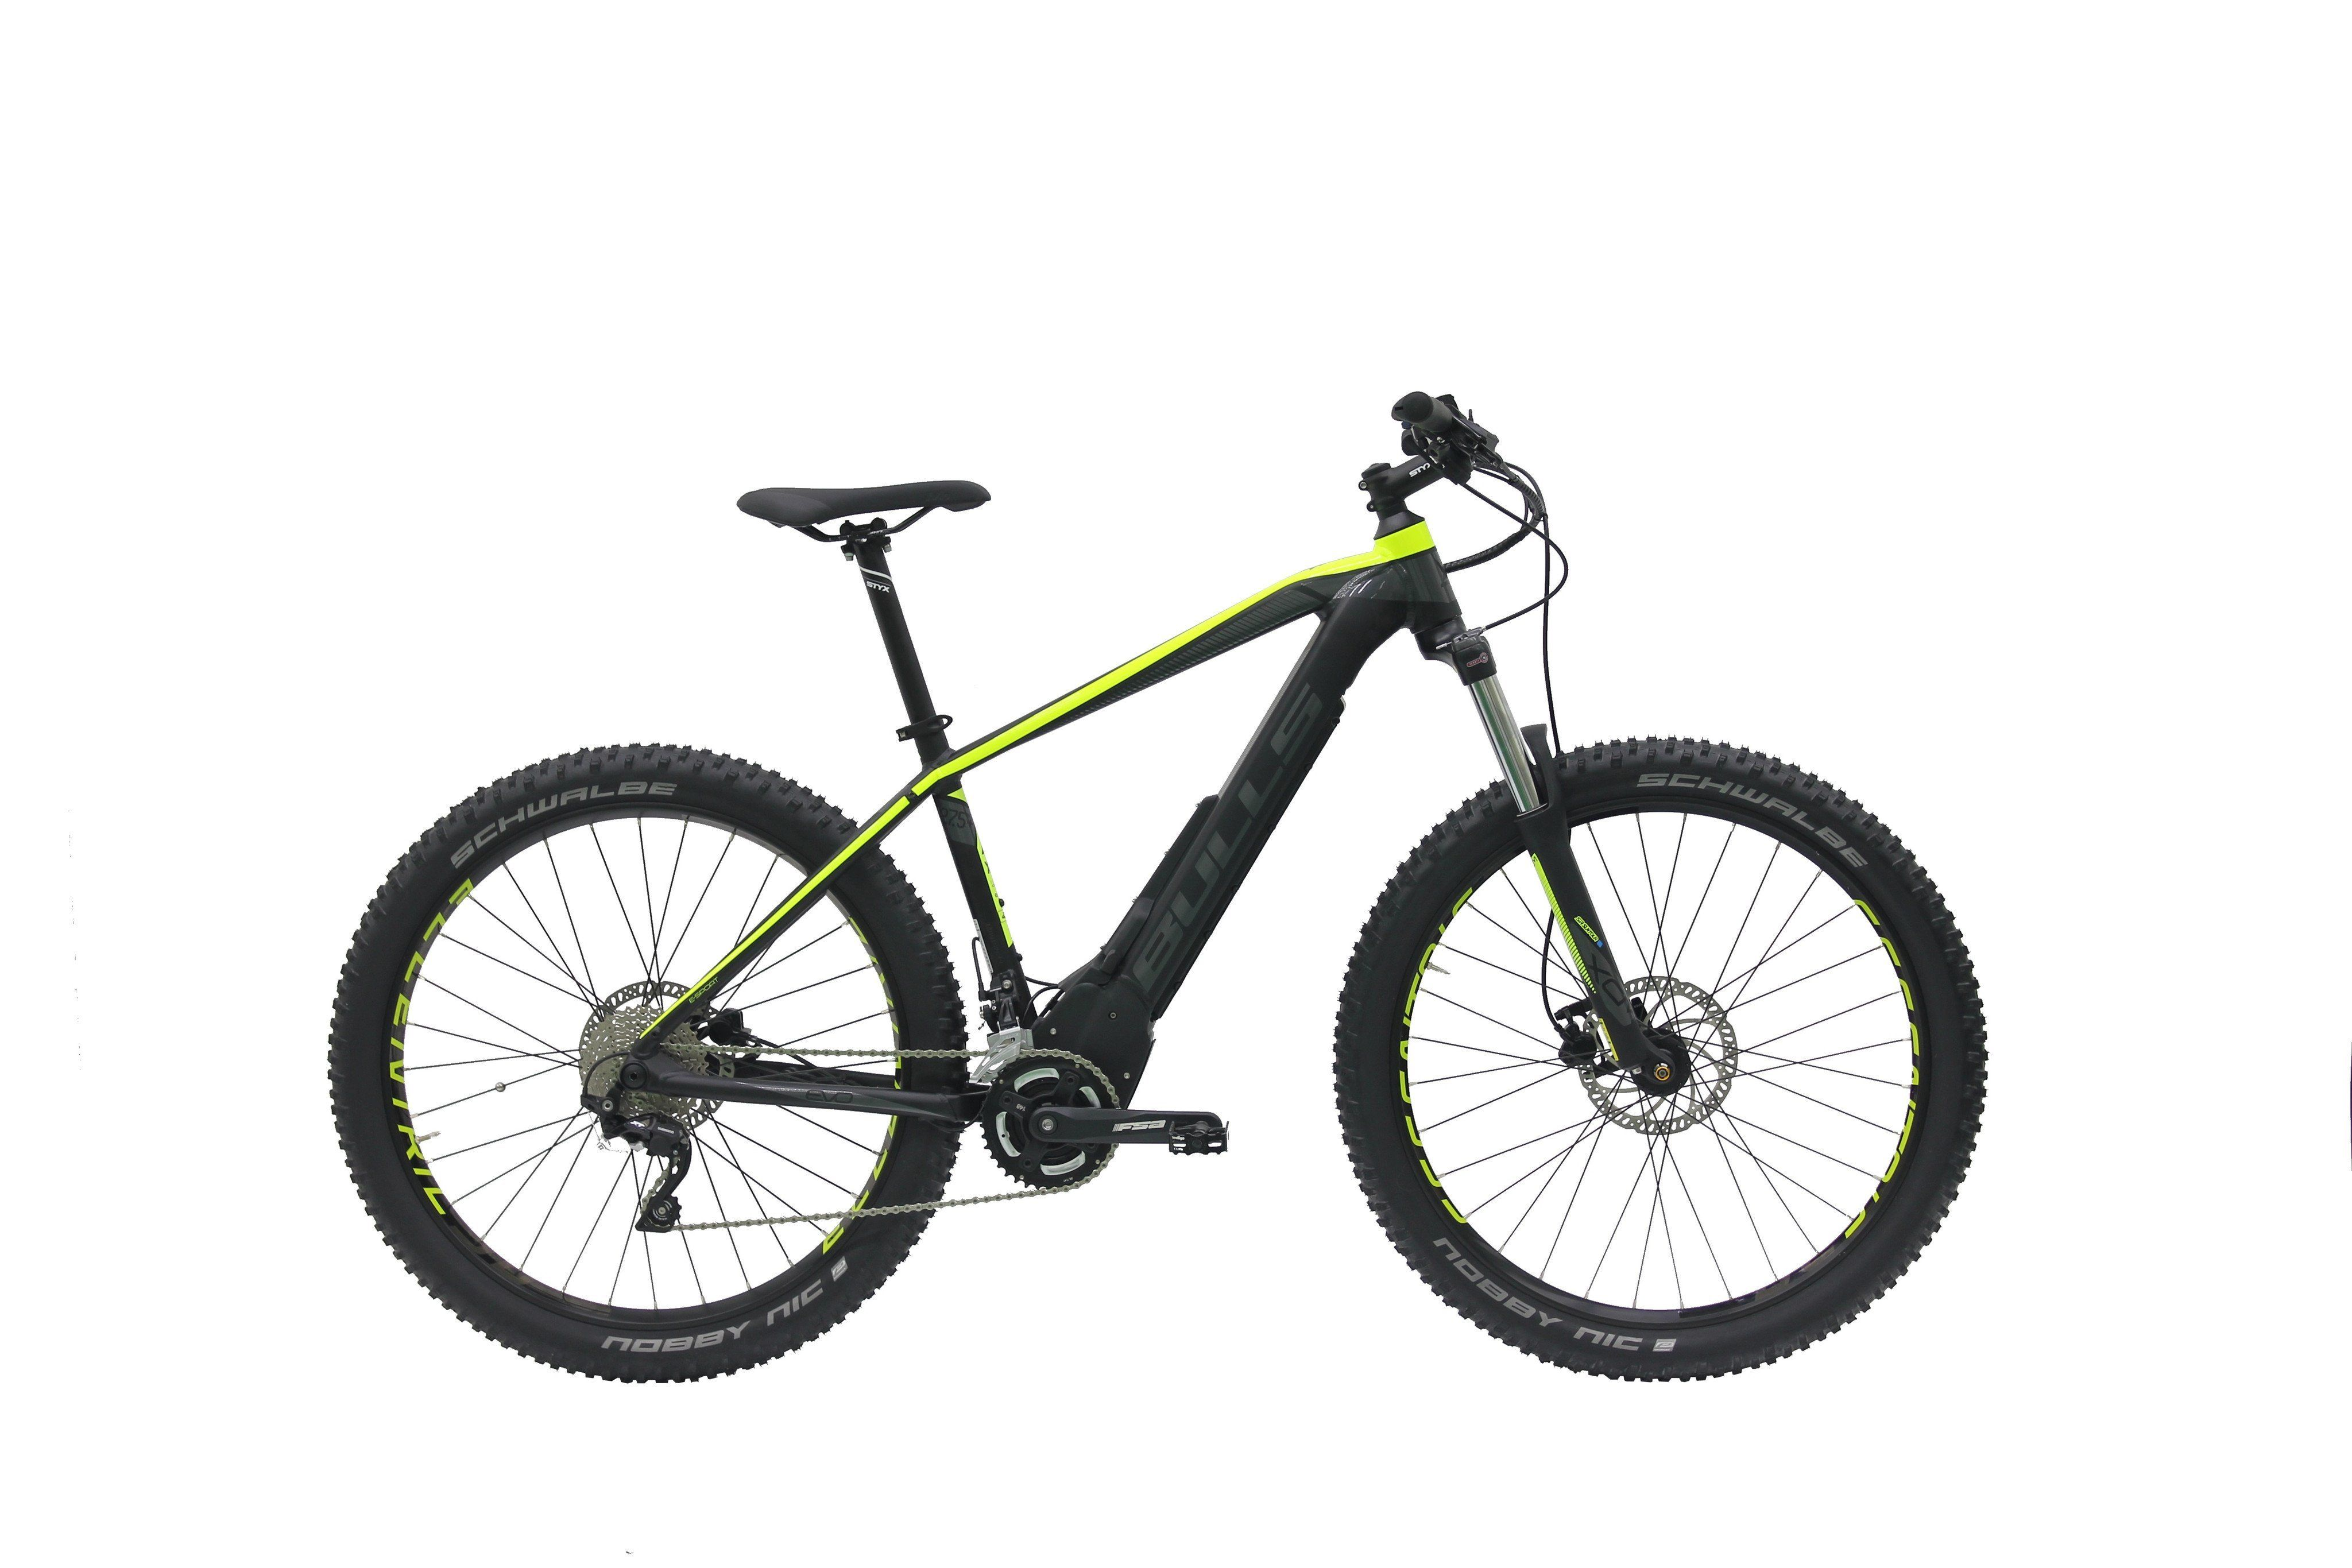 Bulls E Stream Evo 2 27 5 Plus Electric Bicycle Products Electric Bicycle Bicycle Bike Store